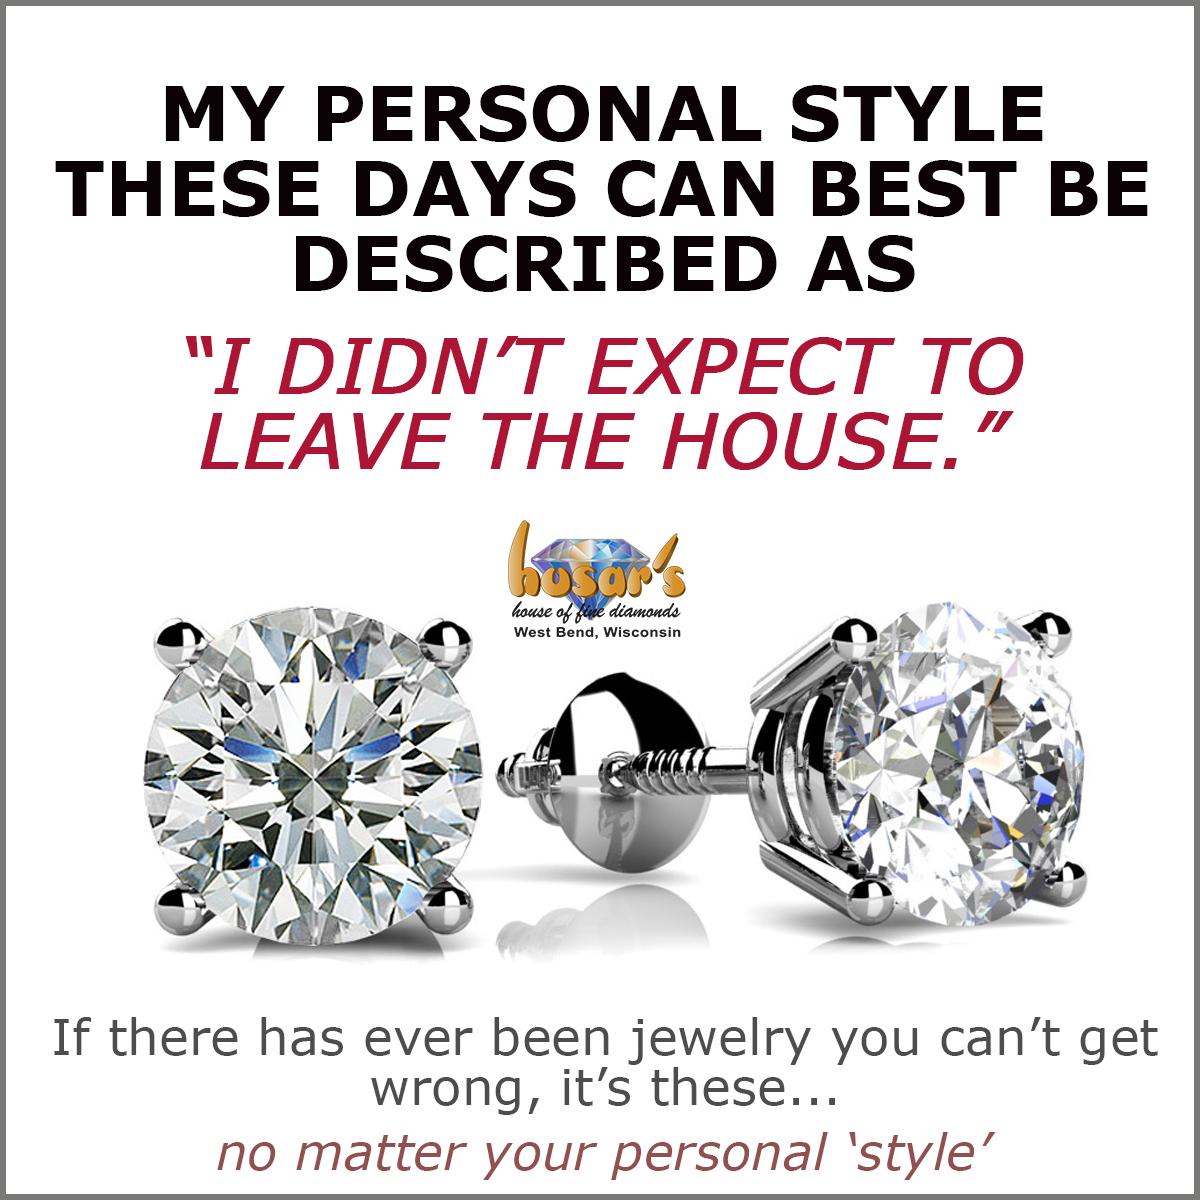 If you need a little pick me up, put on some sparkle, it works every time! #diamonds #sparkle #jewelry #diamondsareagirlsbestfriend #pickmeuppic.twitter.com/c6kEoazyka